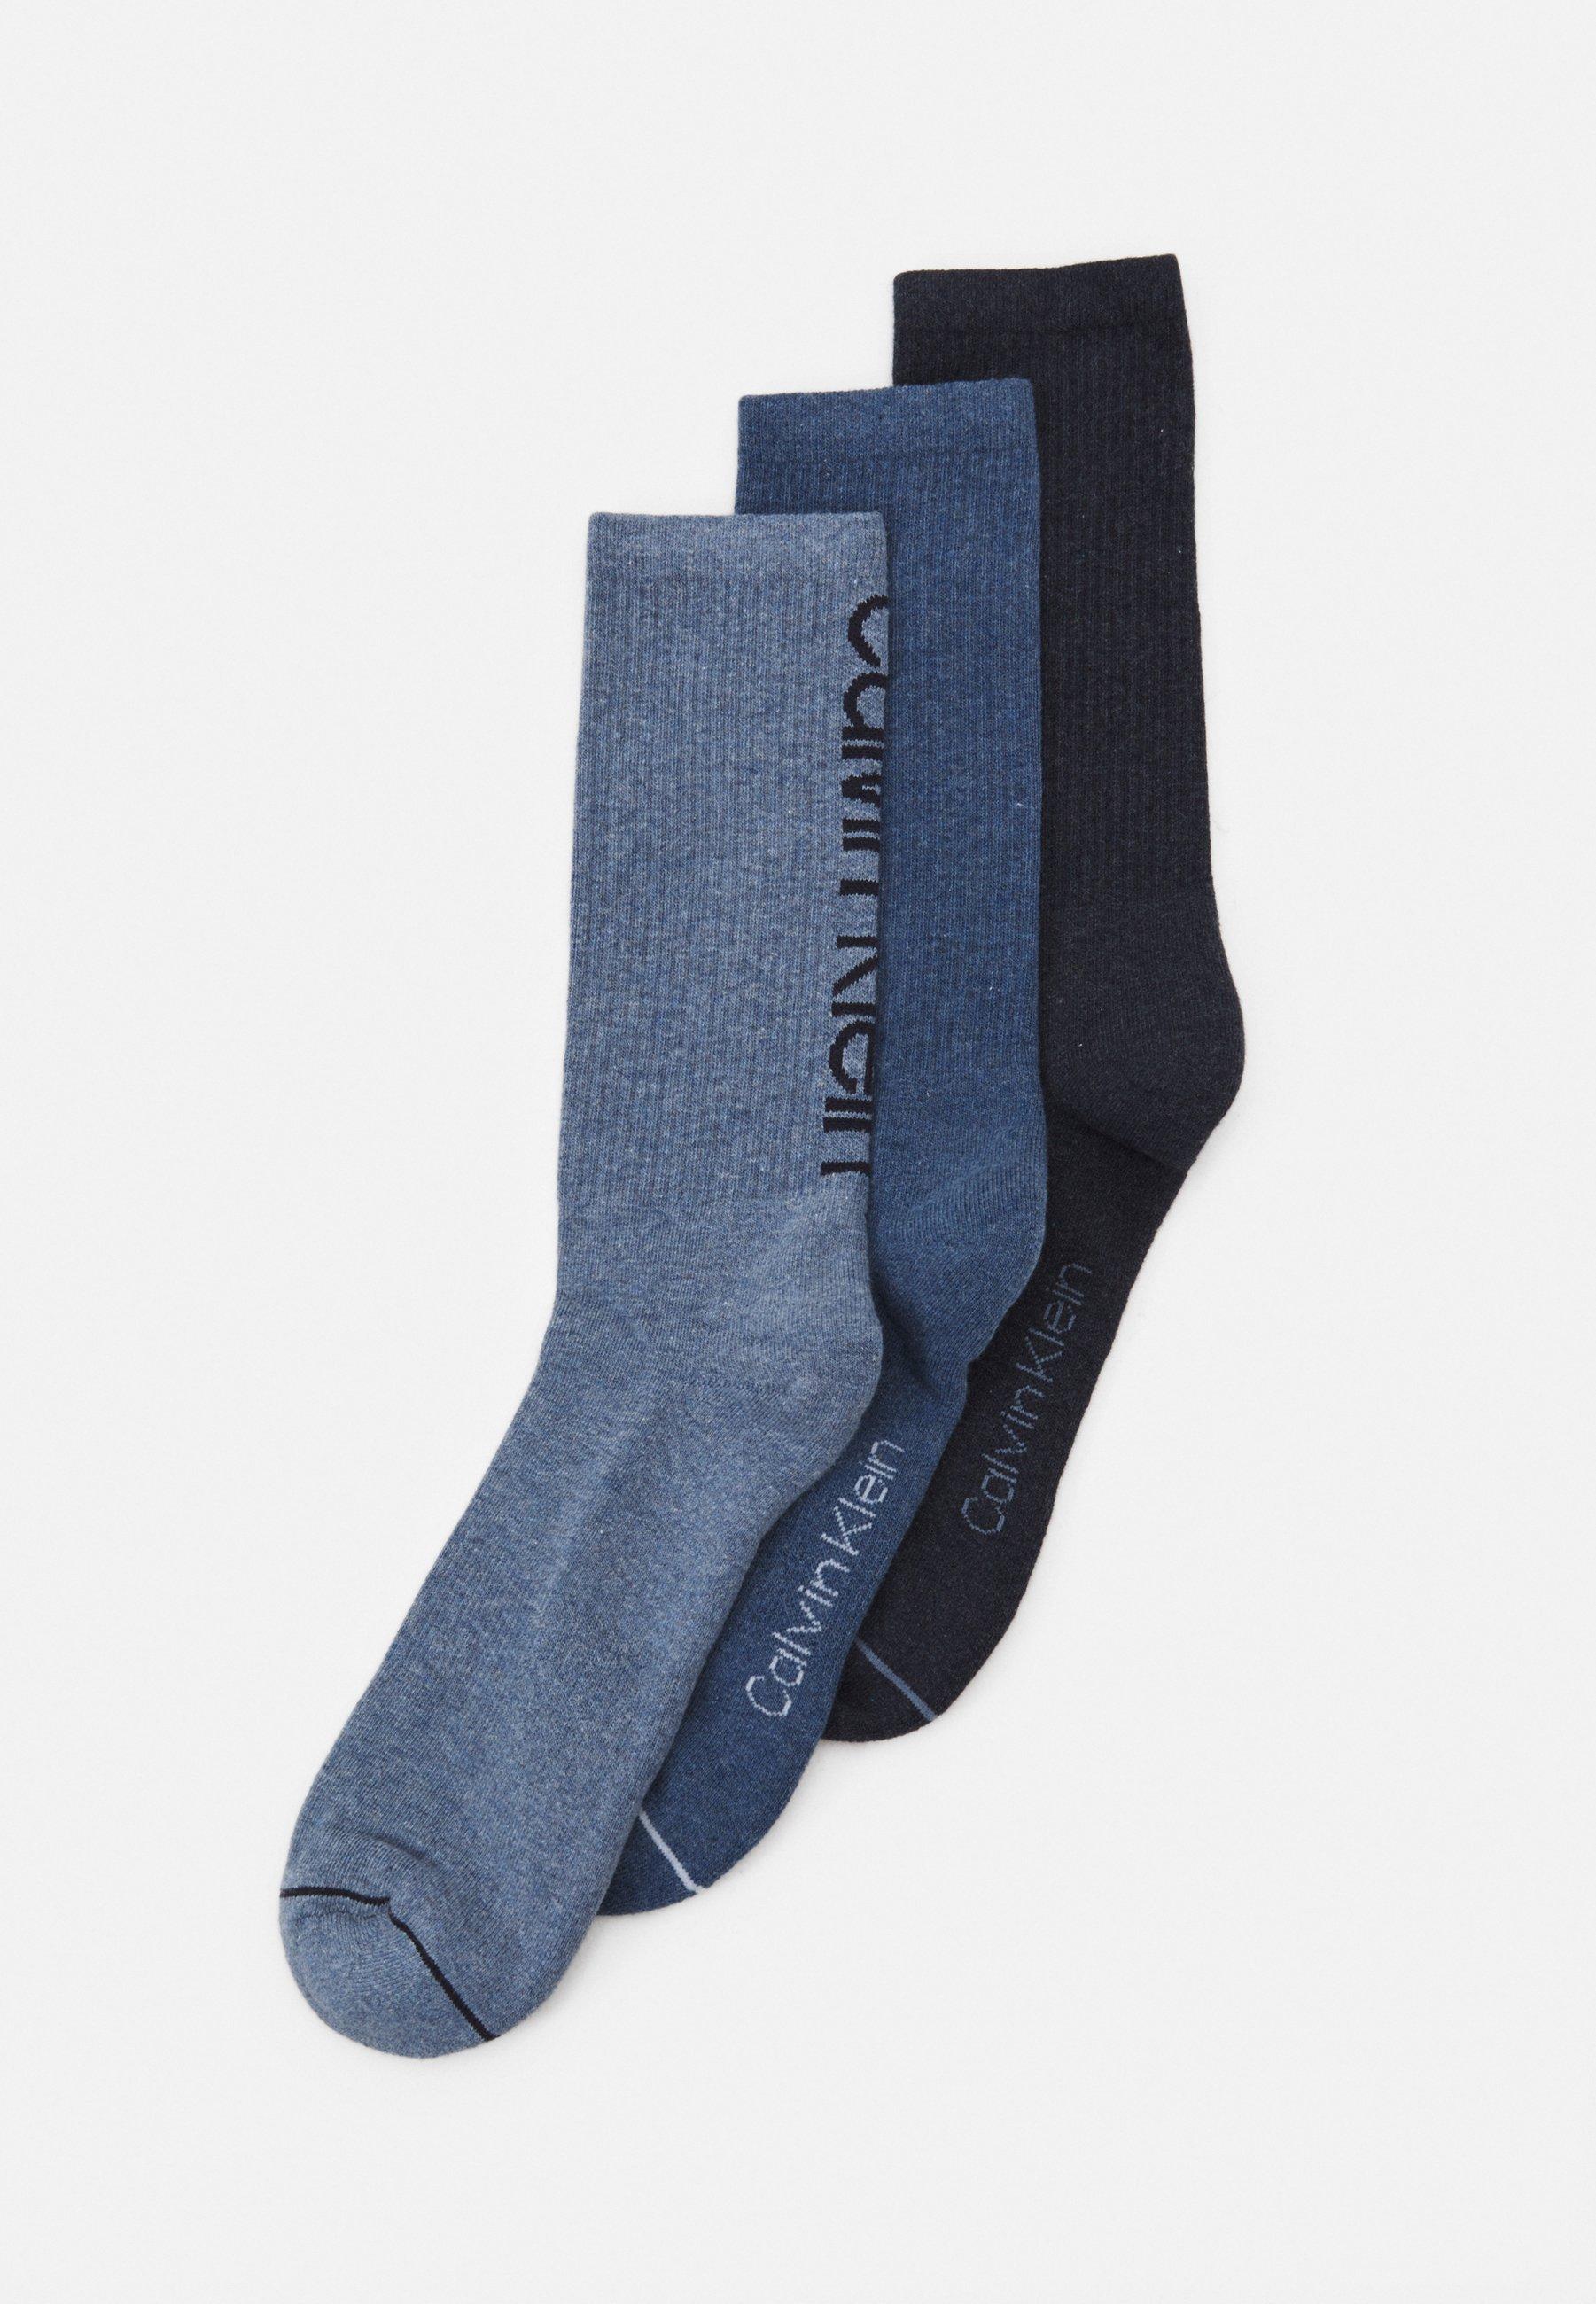 Femme SOCK ATHLEISURE 3 PACK UNISEX - Chaussettes